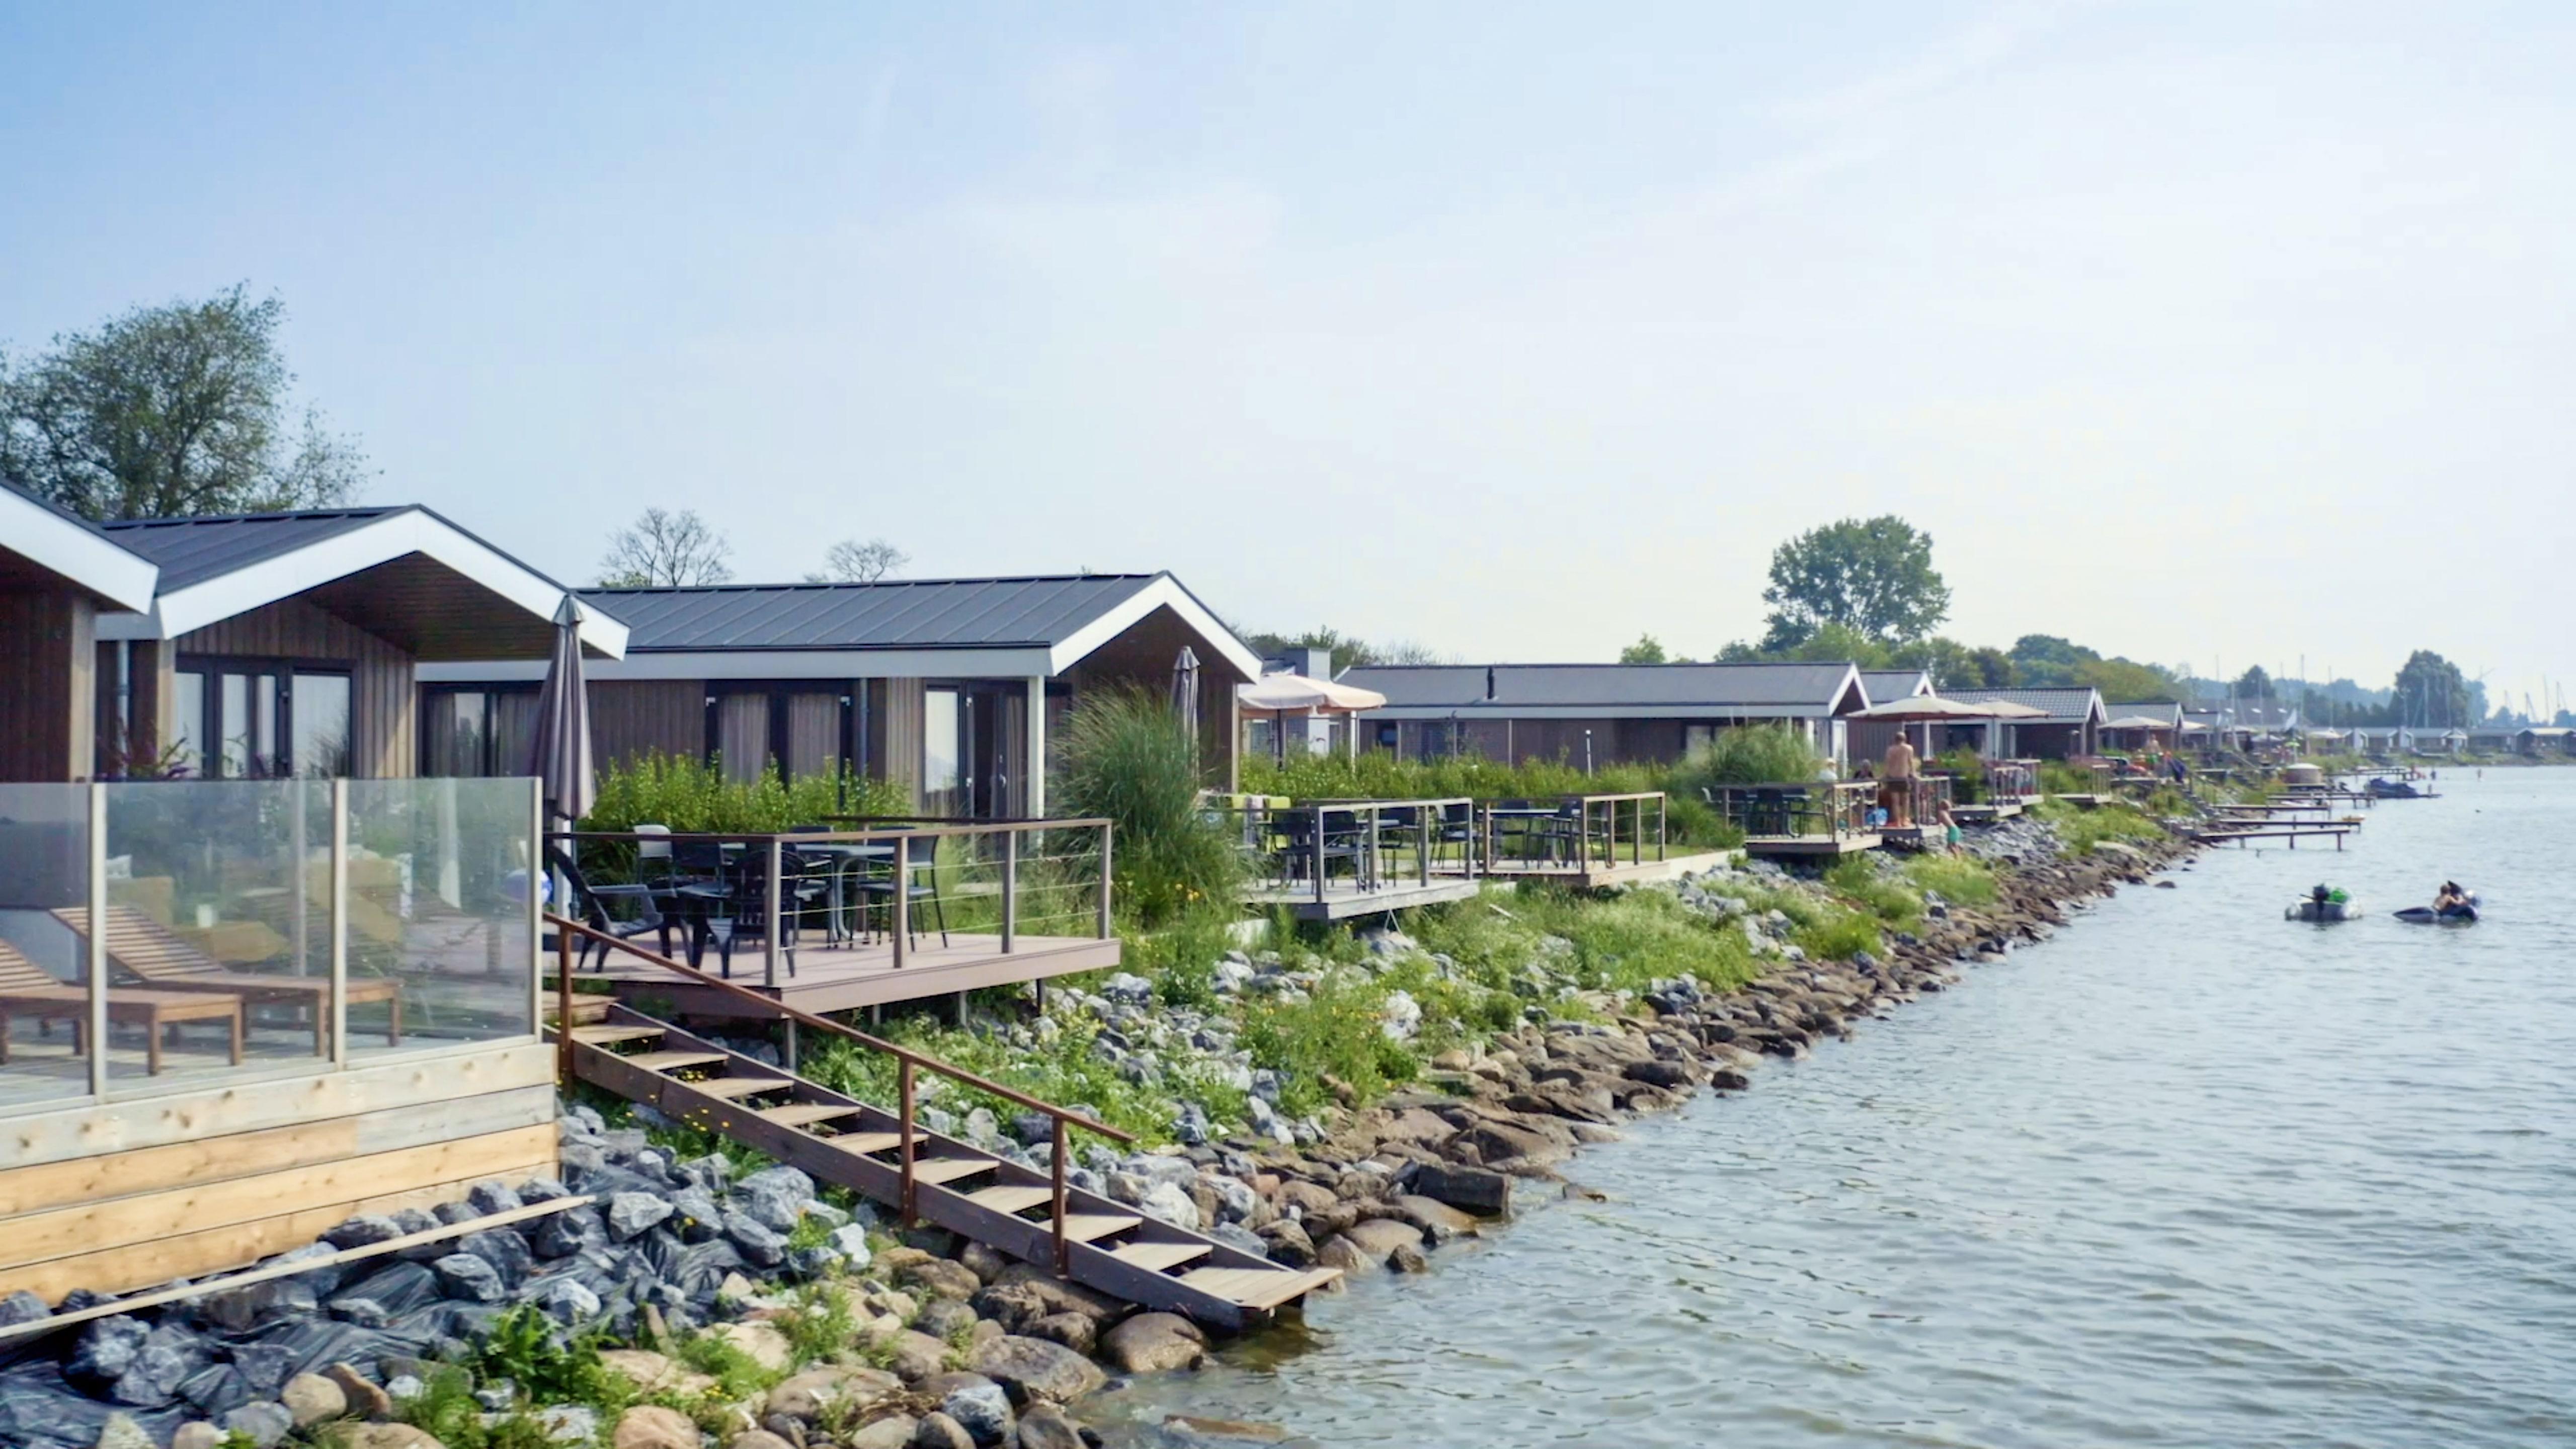 europarcs-resort-markermeer